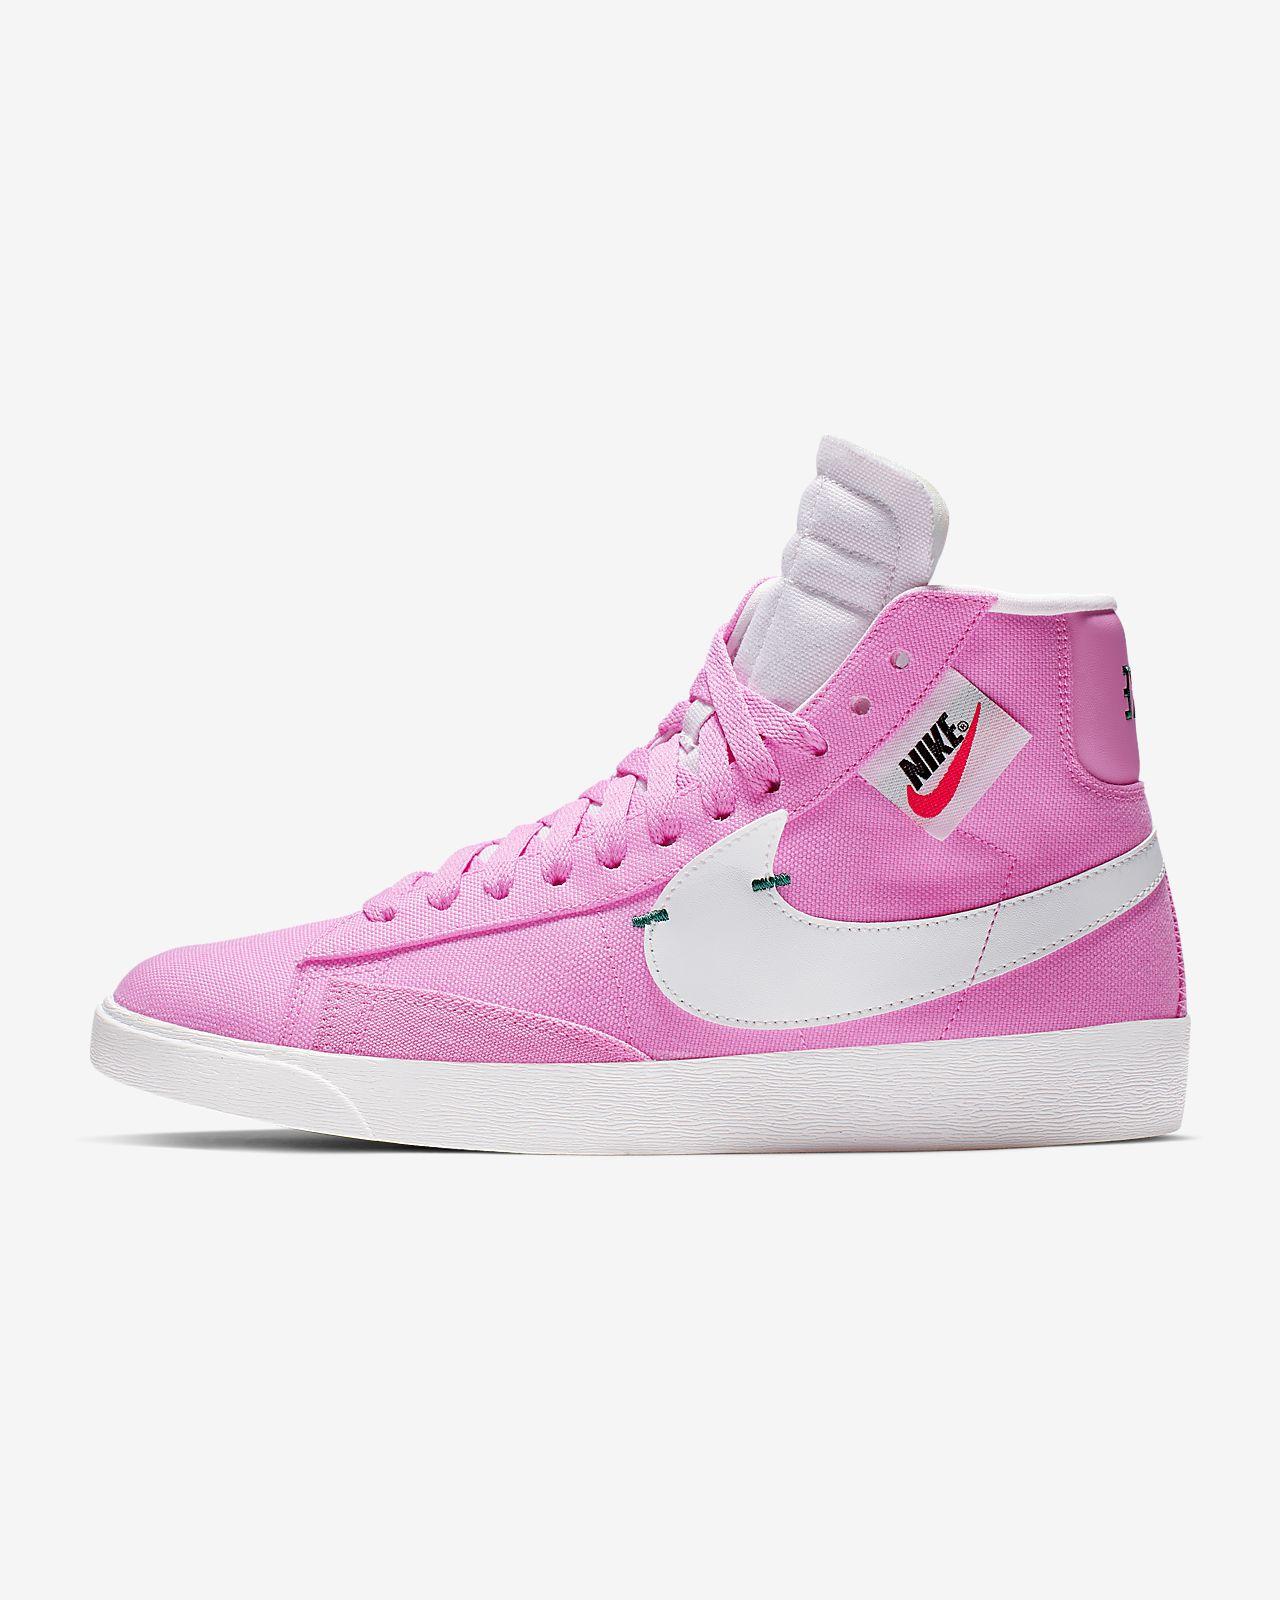 NikeBlazer Mid Rebel女子运动鞋